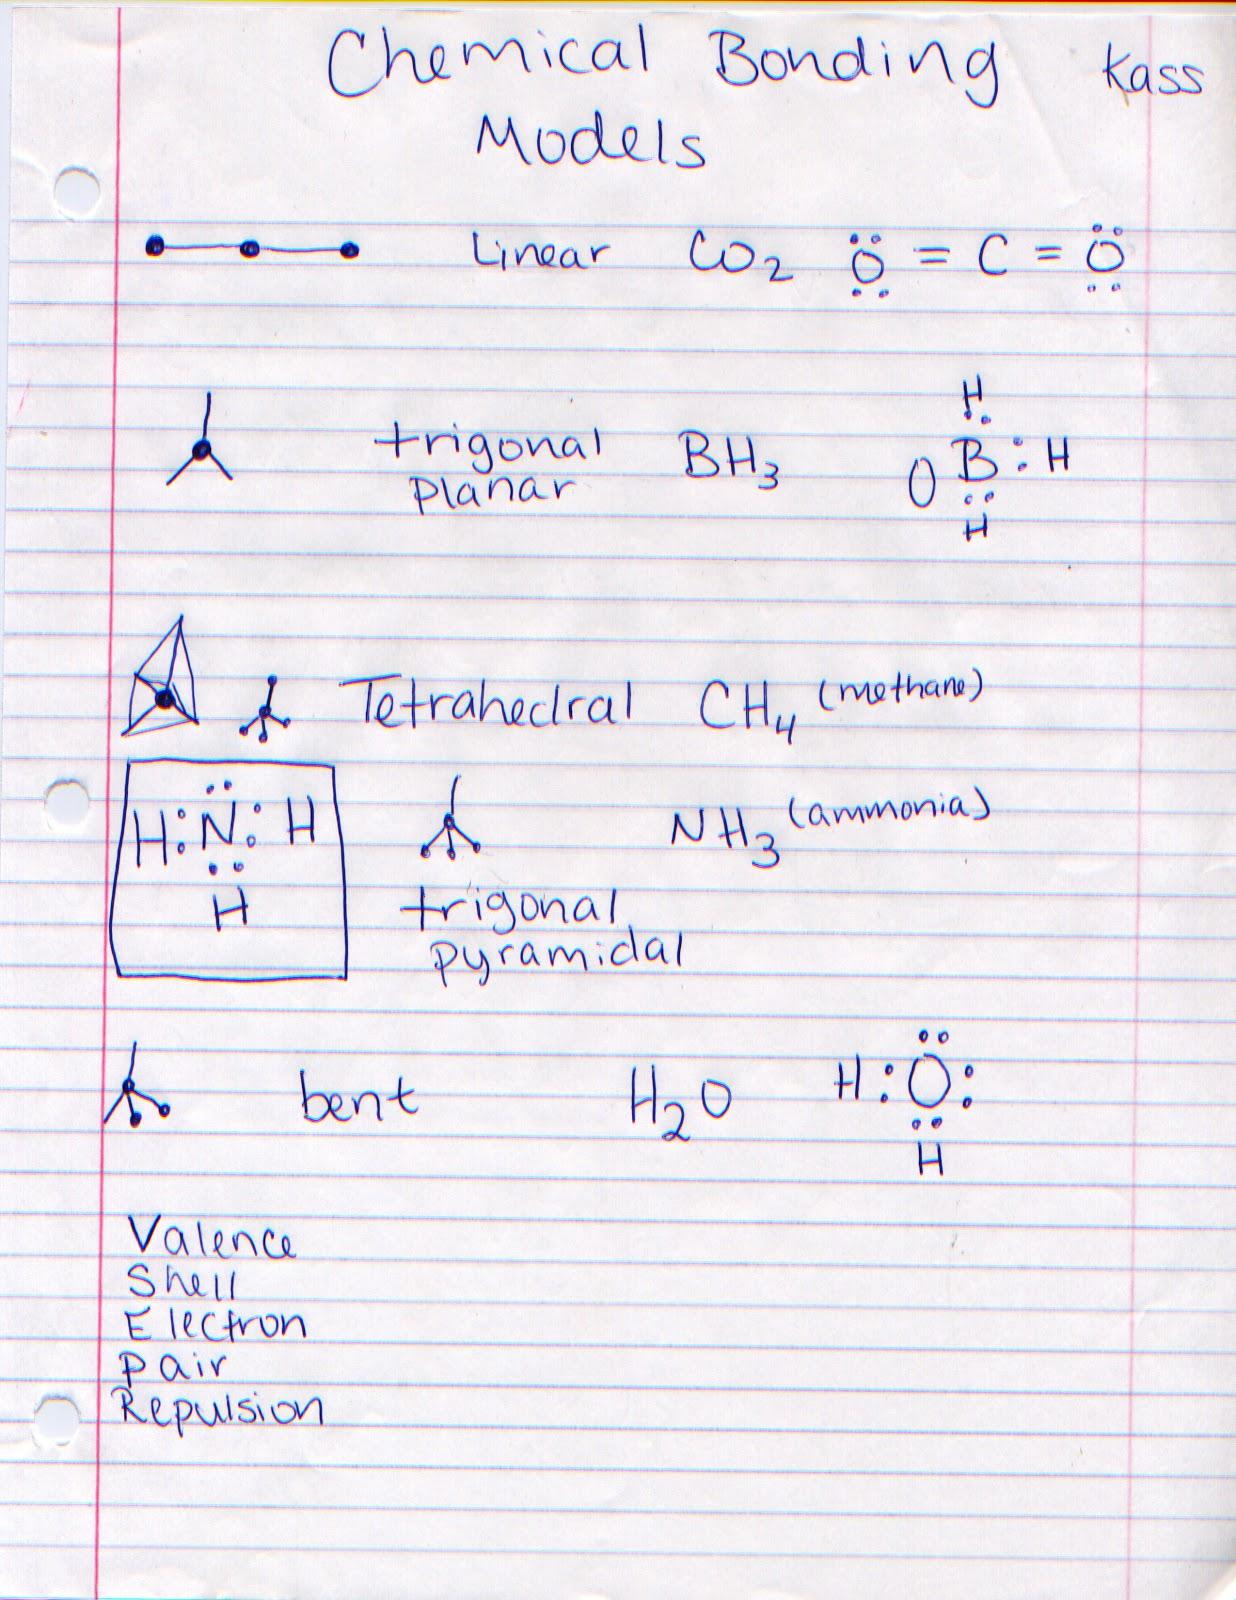 Kassidy S Penny S Chemistry Blog Chemical Bonding